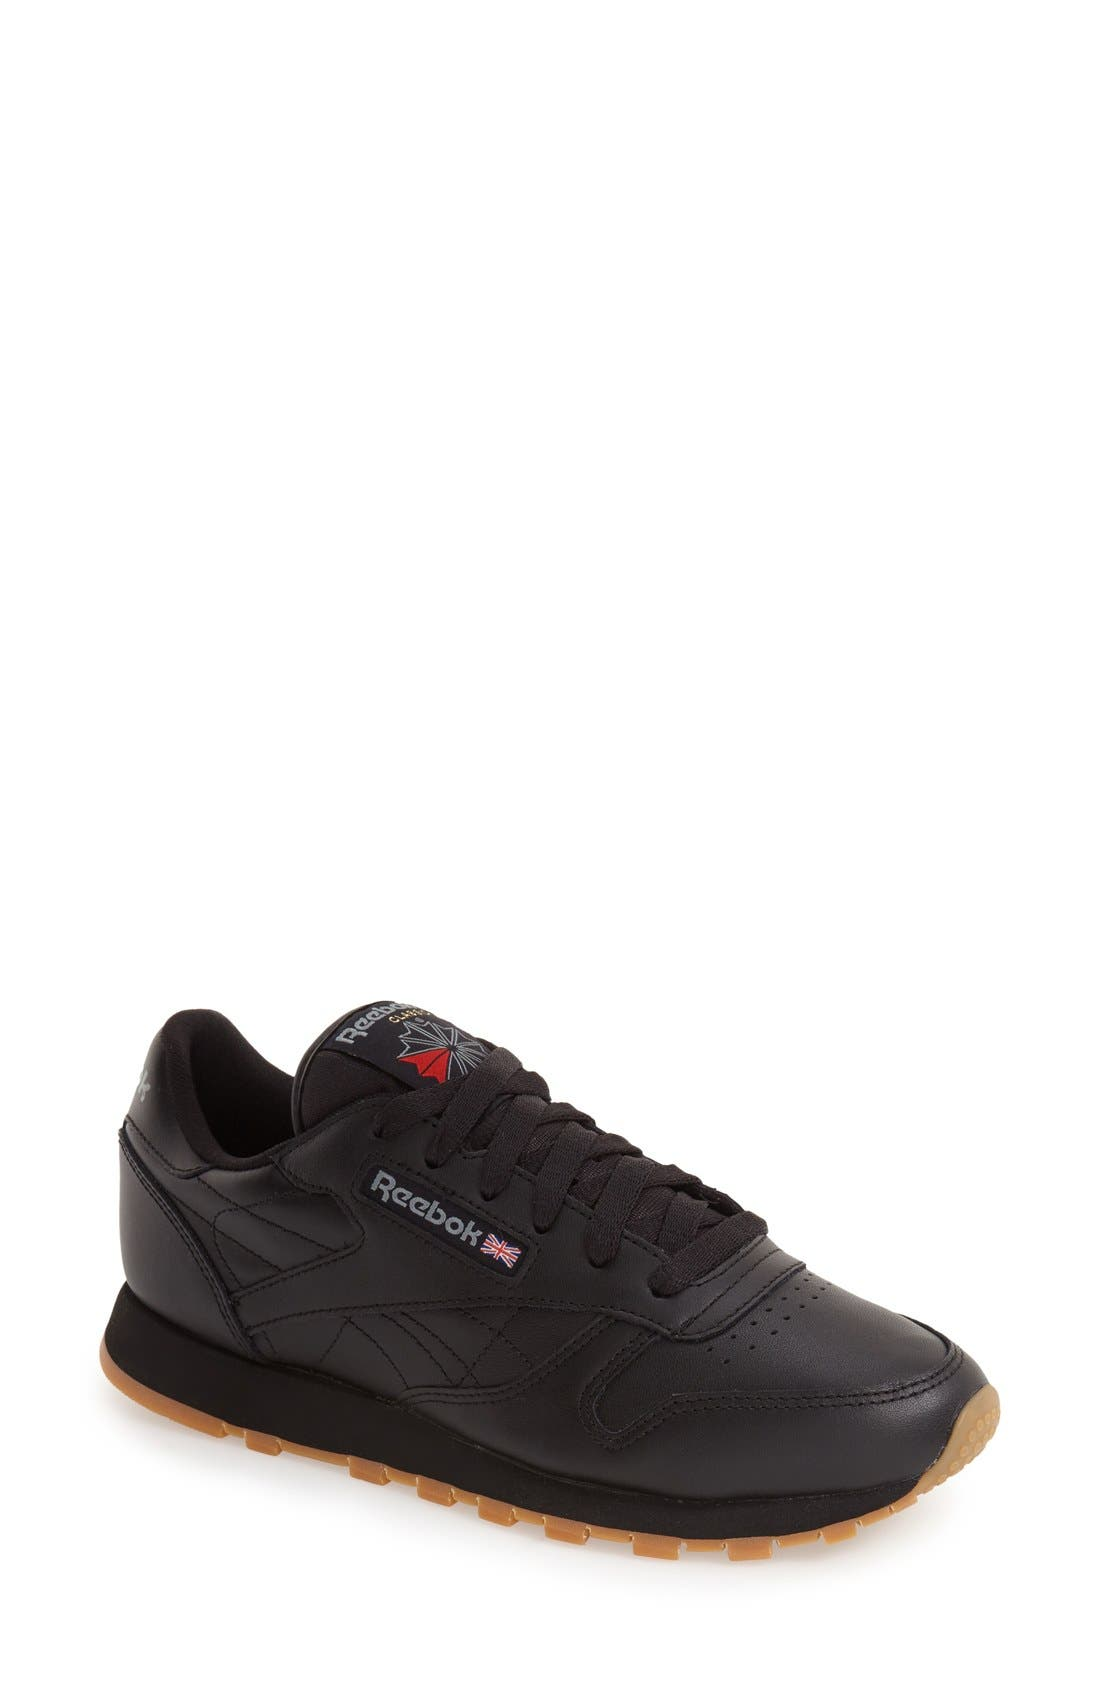 Alternate Image 1 Selected - Reebok 'Classic' Sneaker (Women)